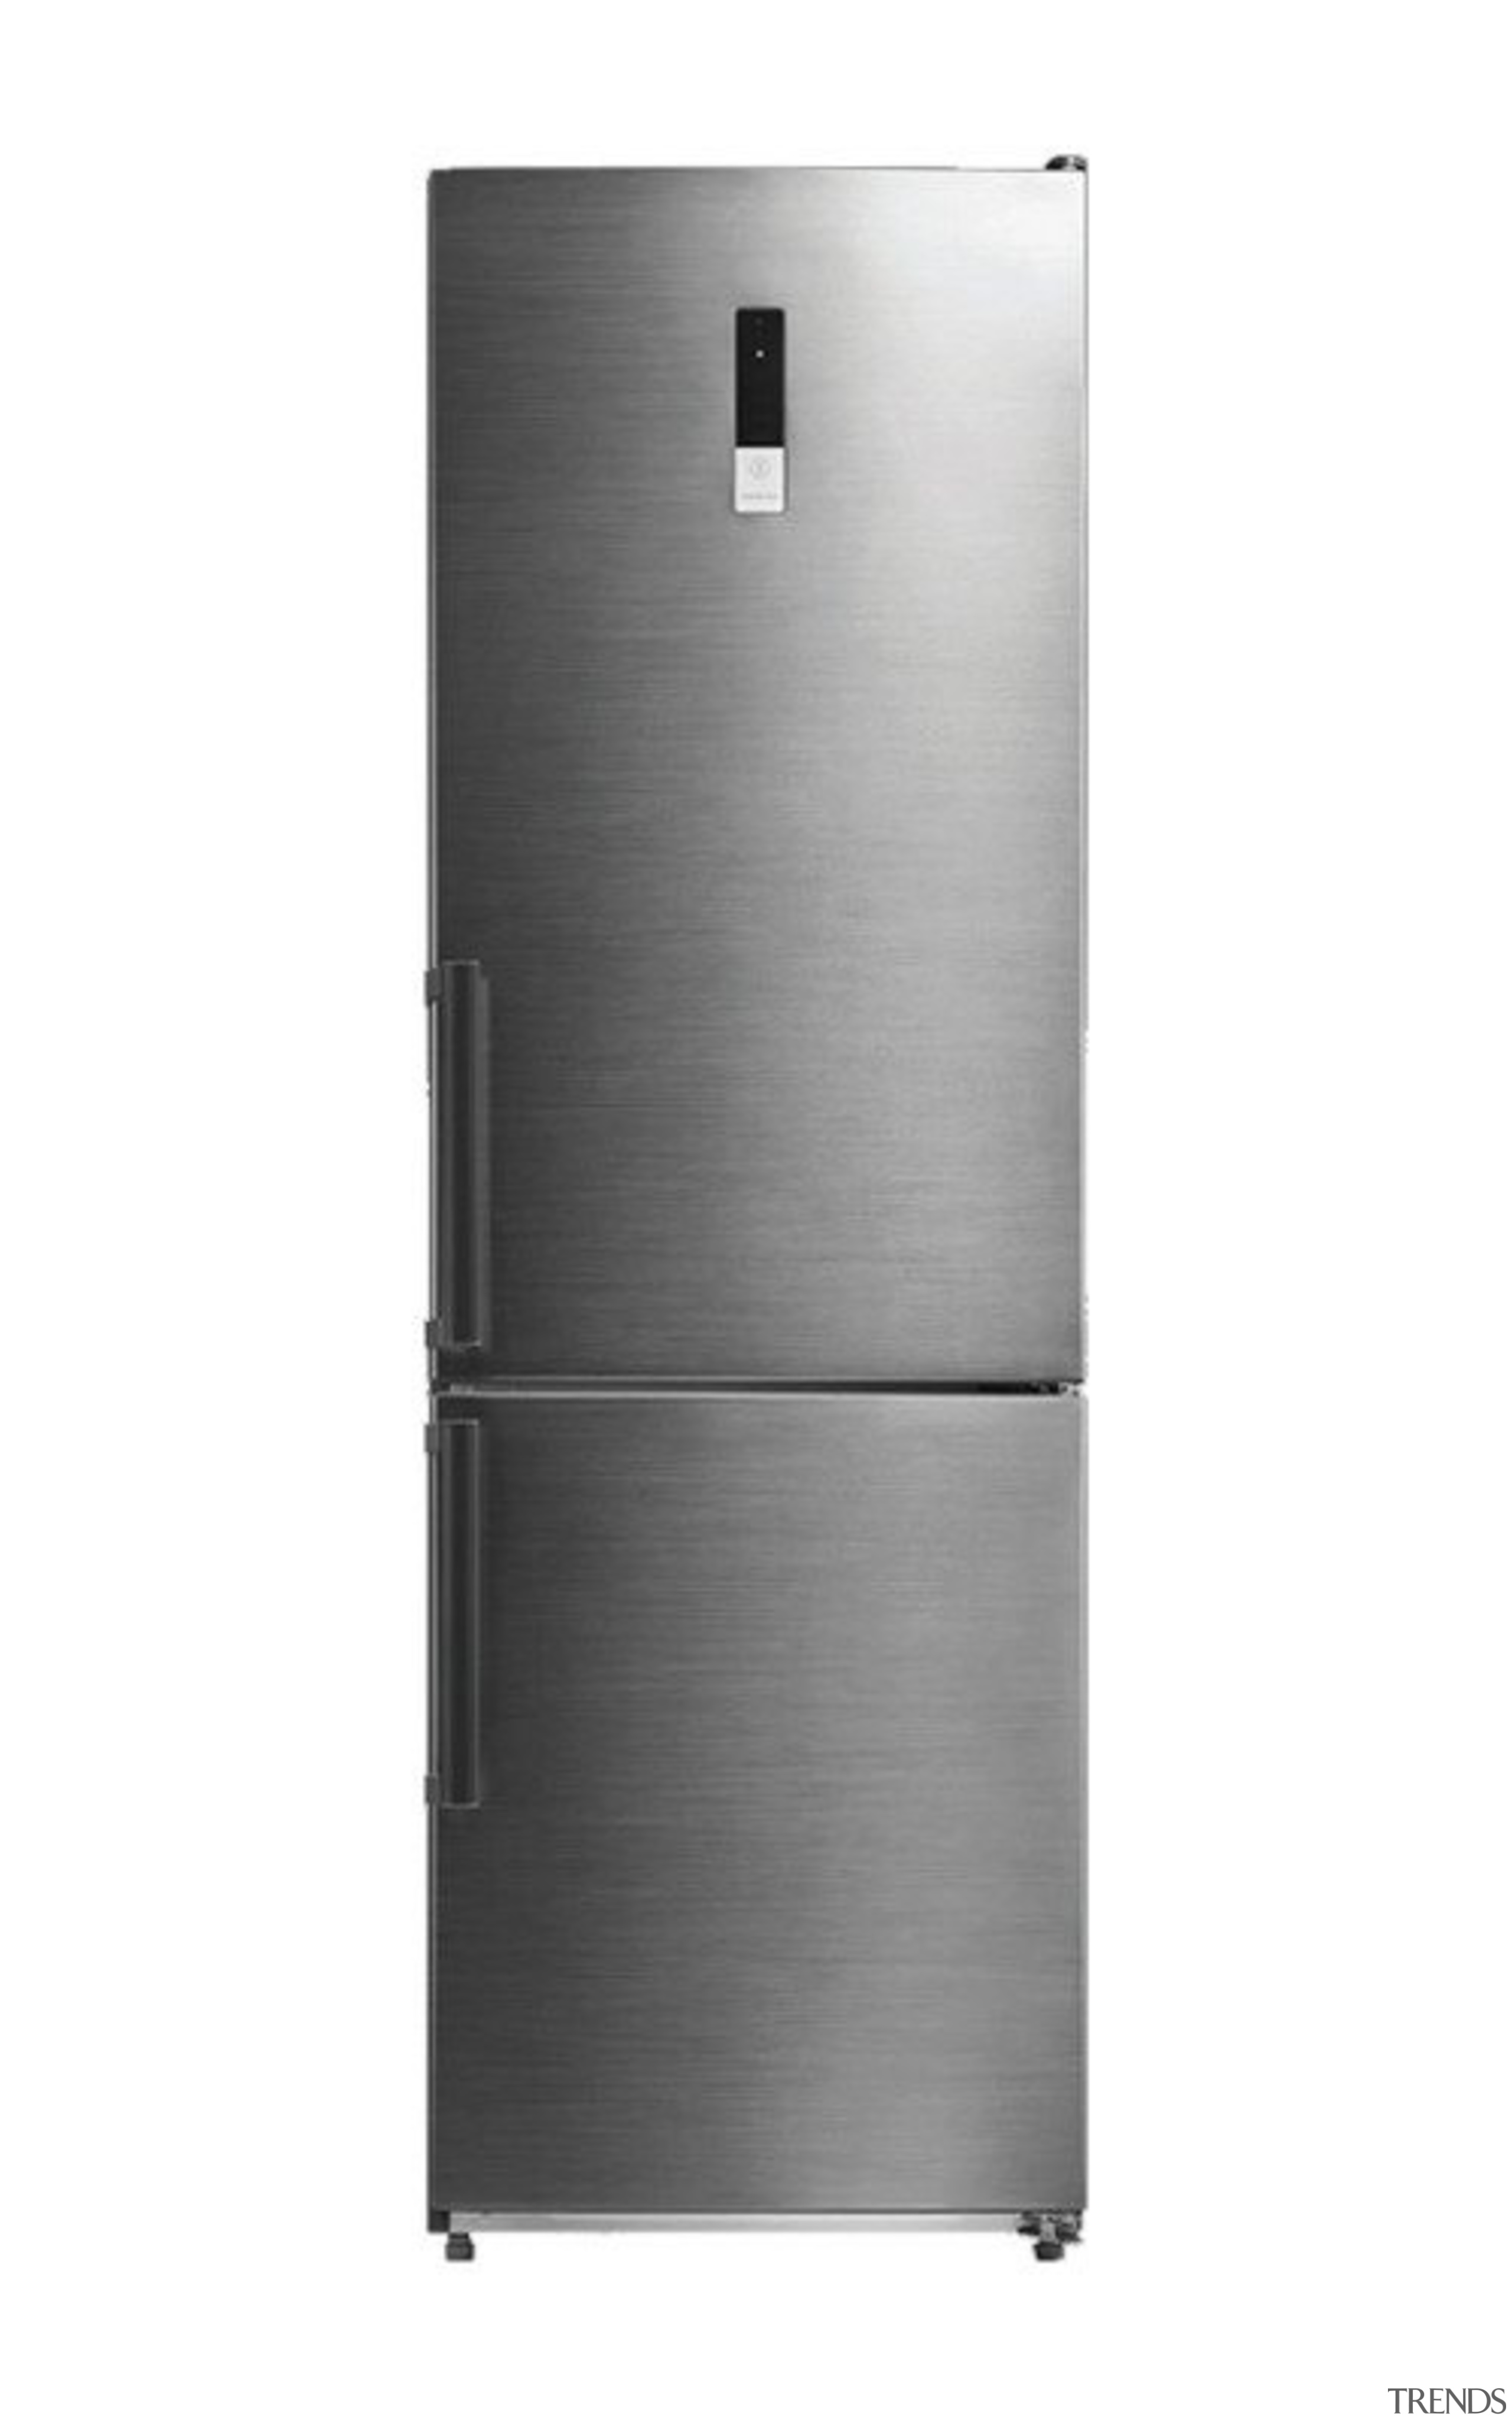 315L Bottom Mount Fridge FreezerCapacity (Gross): 315LTotal no home appliance, kitchen appliance, major appliance, product, product design, refrigerator, white